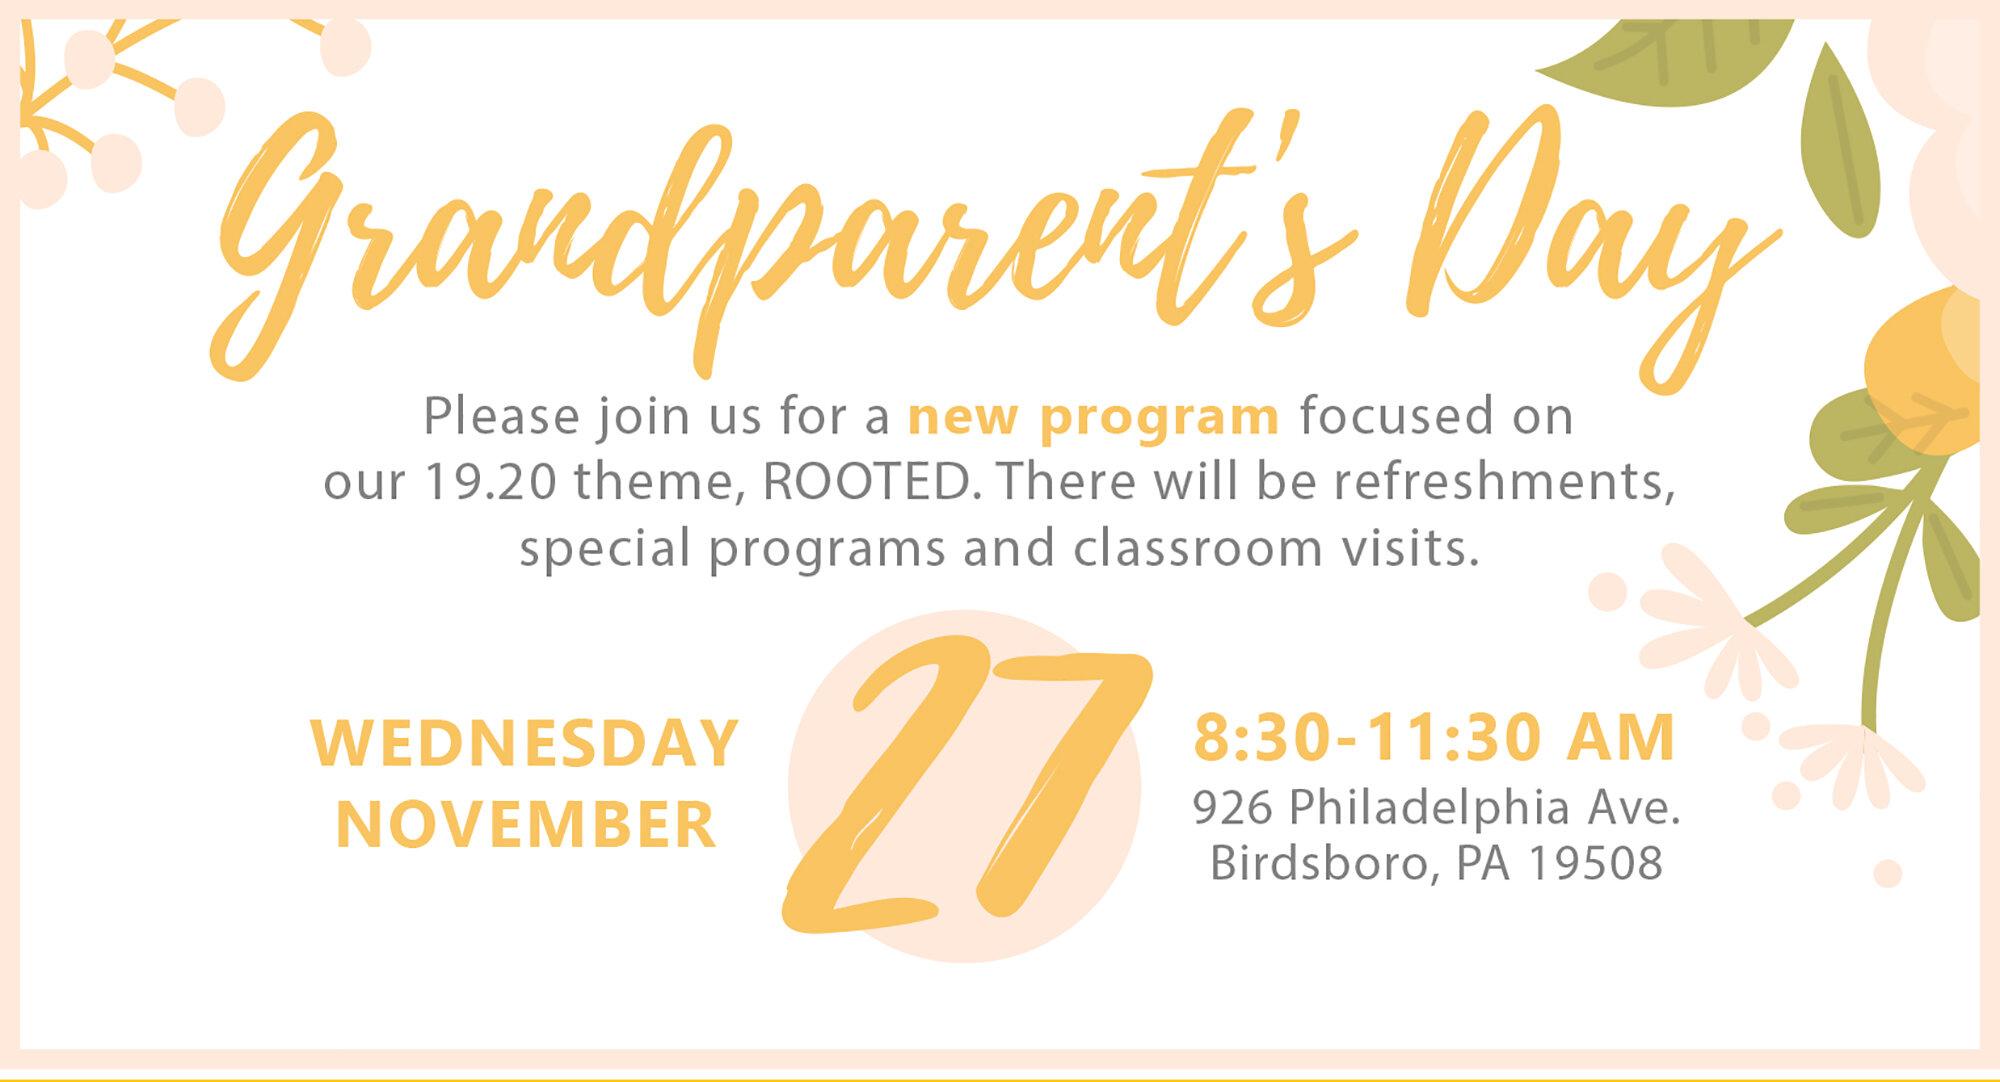 grandparents day invite 2019 beat.jpg